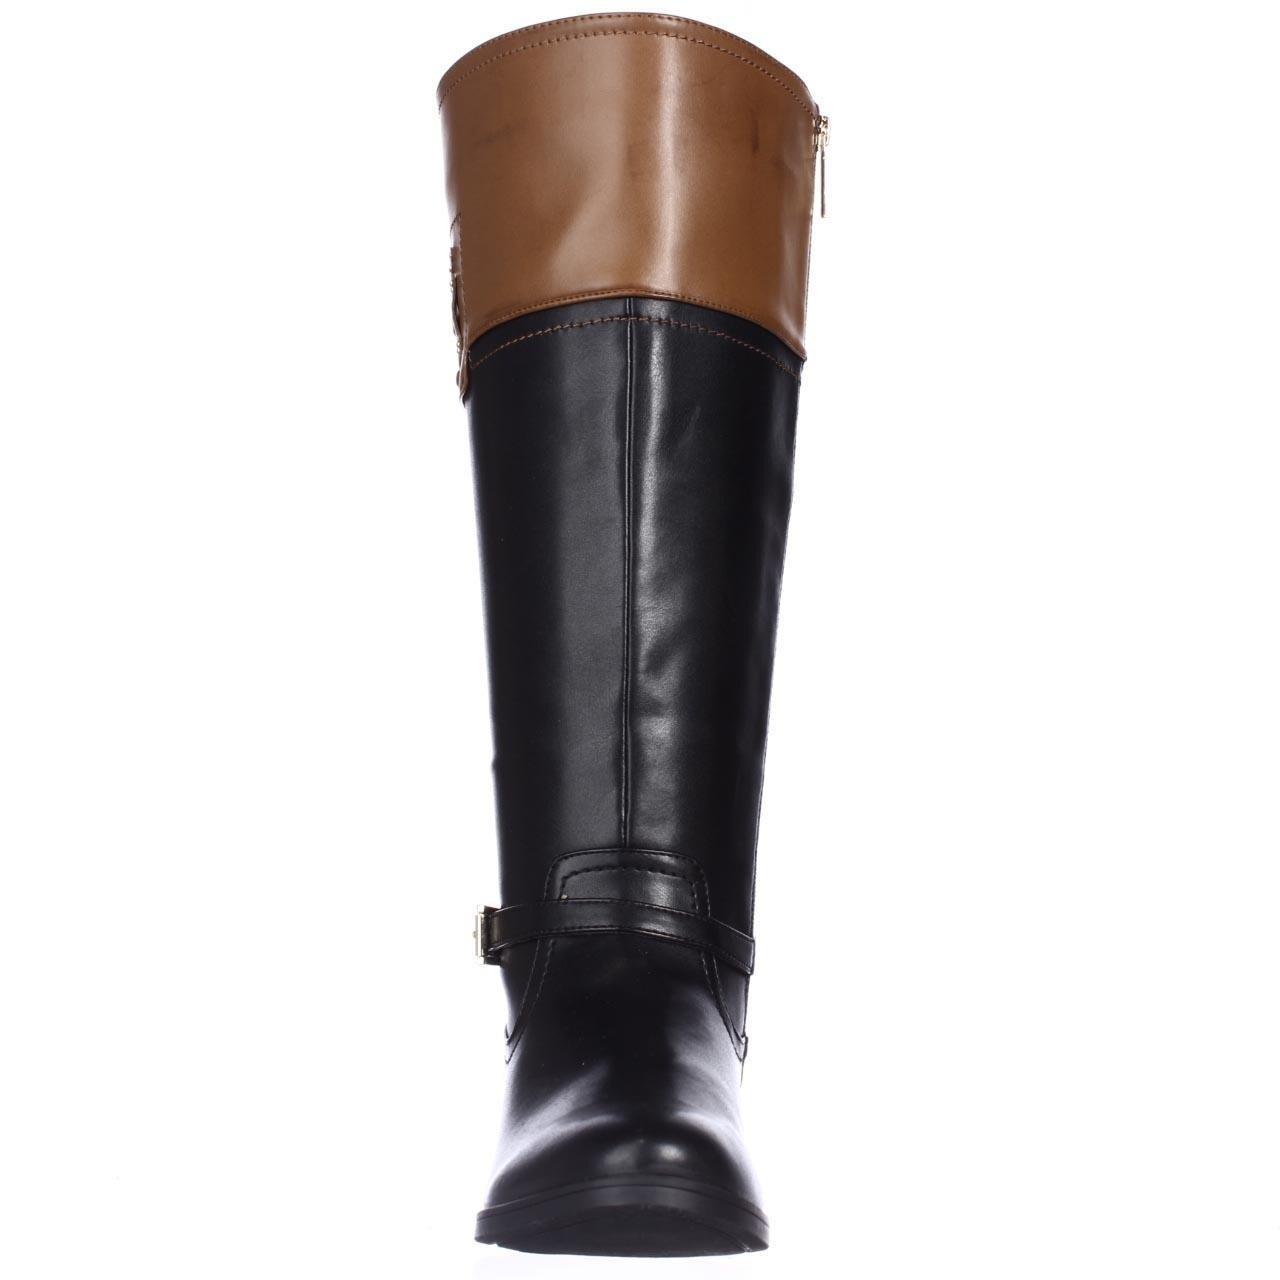 6dcab9bc3c92 Shop Tommy Hilfiger Drea2 Wide Calf Knee-High Riding Boots